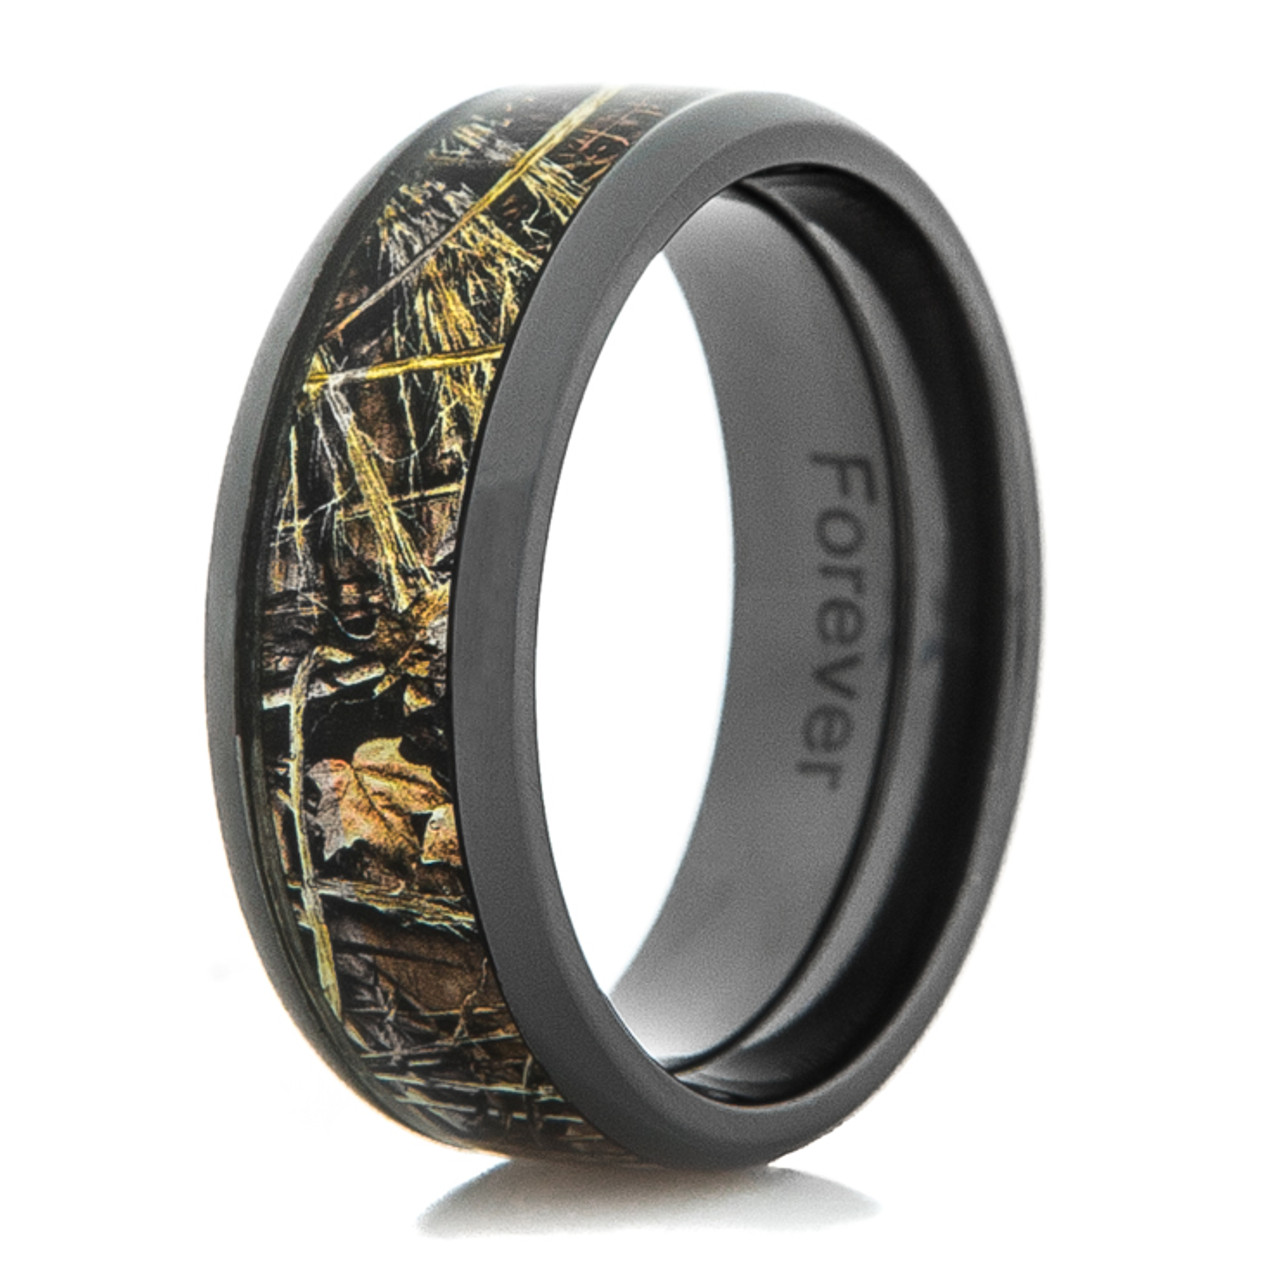 Realtree Wedding Rings Advantage Timber Camo Rings Camo Bands